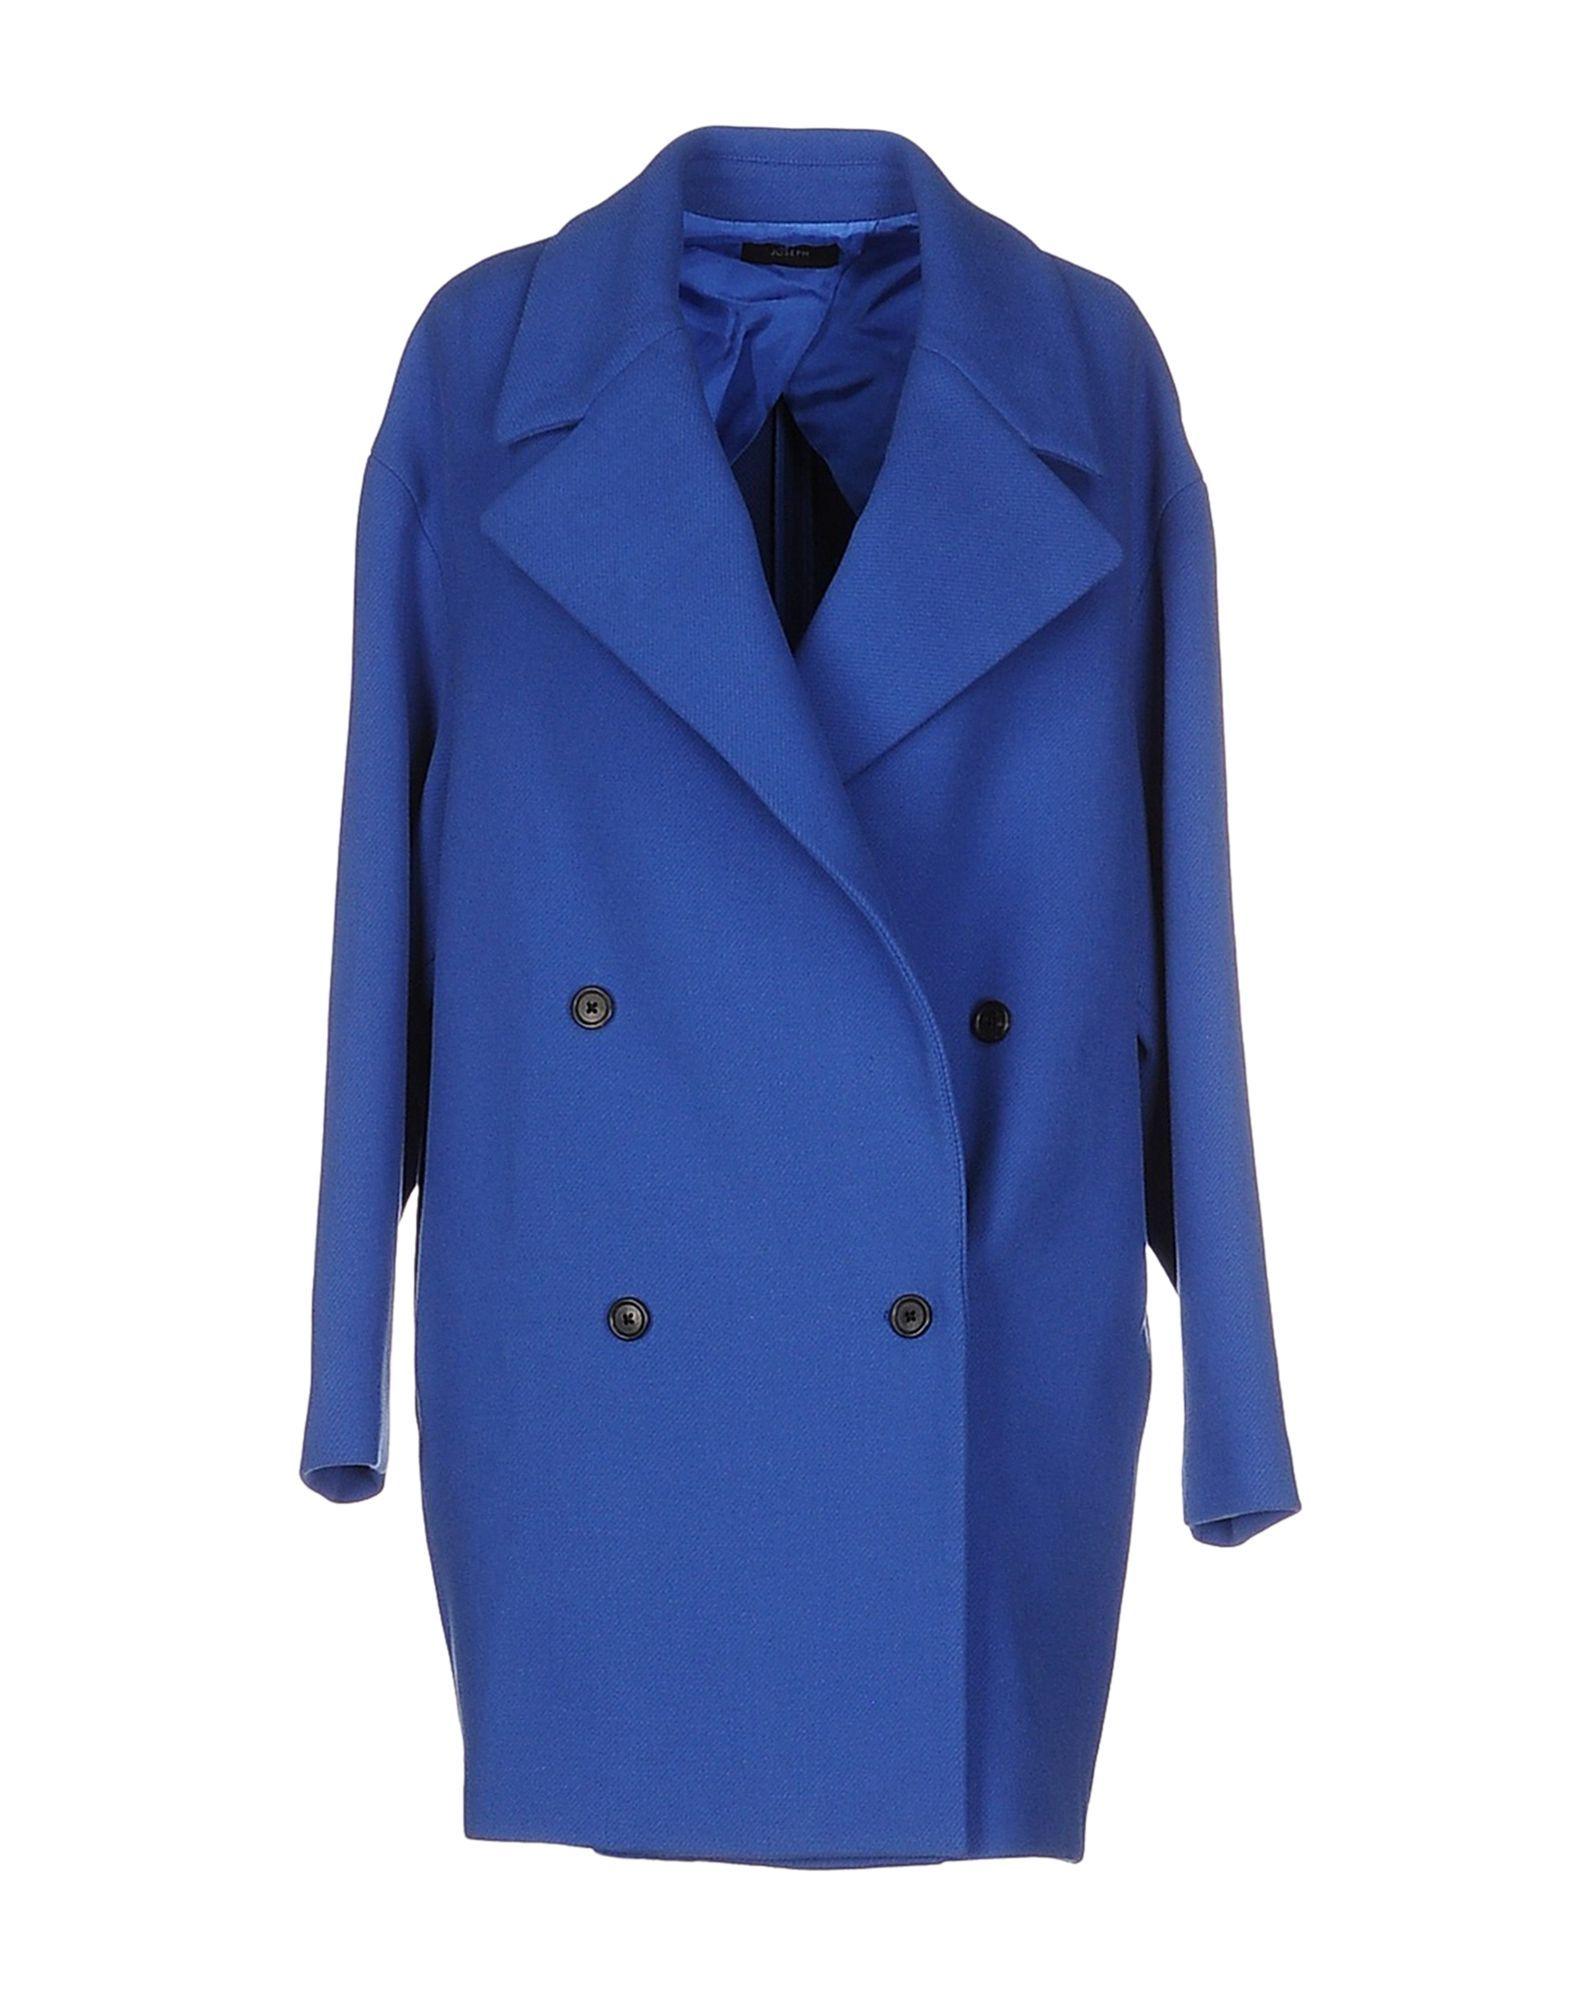 Joseph Пальто Для Женщин - Пальто Joseph на YOOX - 41614543AL